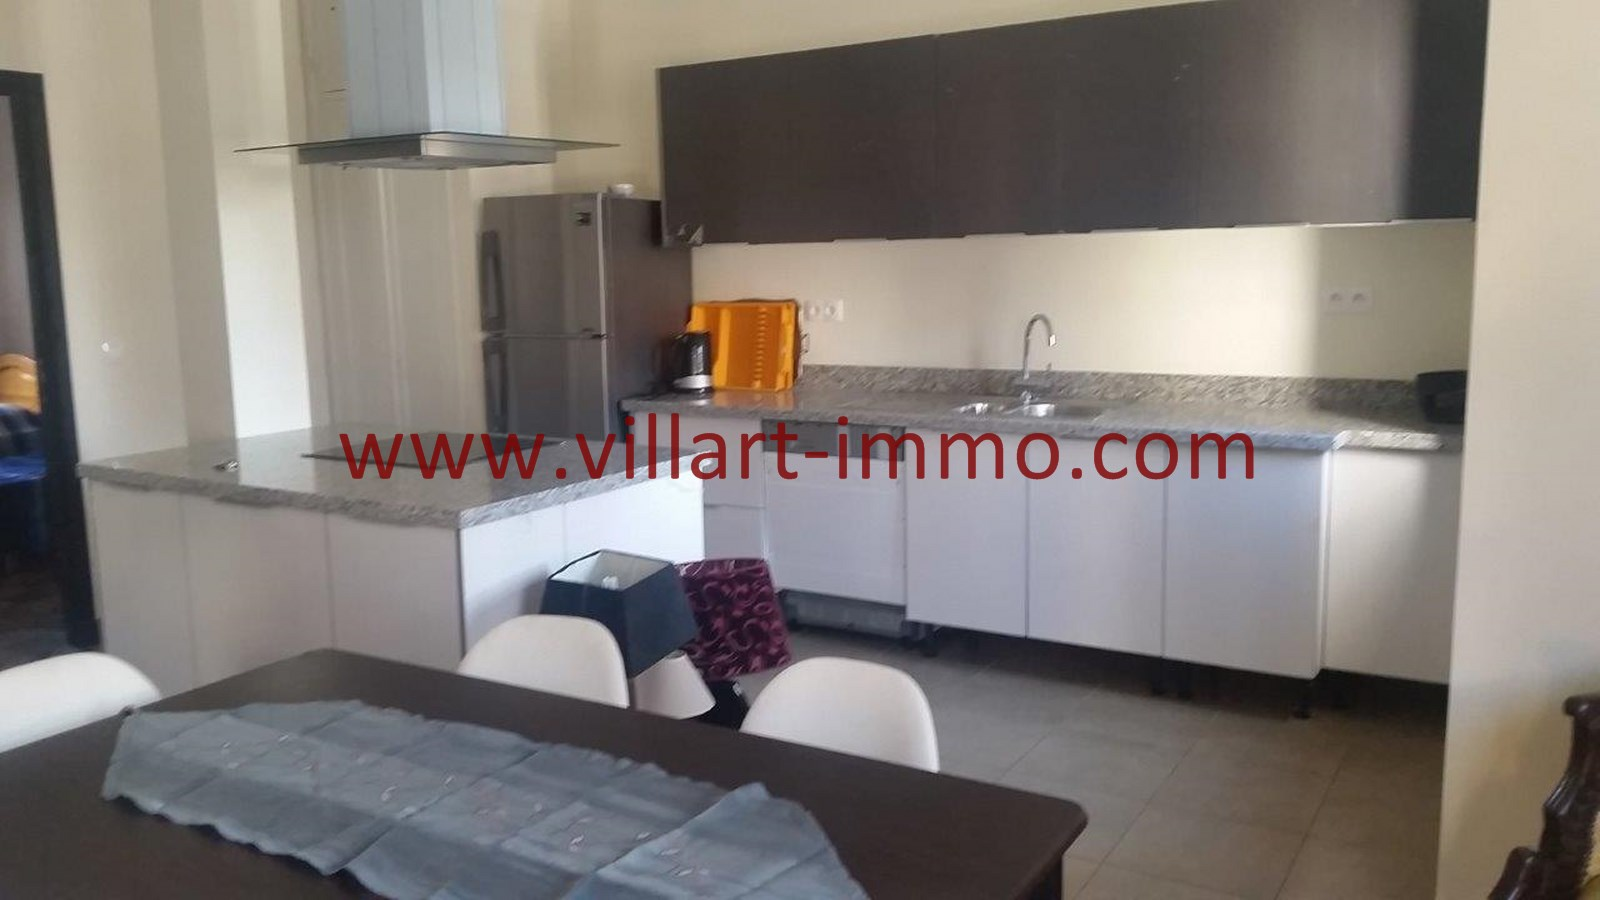 6-a-louer-appartement-centre-ville-tanger-cuisine-2-l964-villart-immo